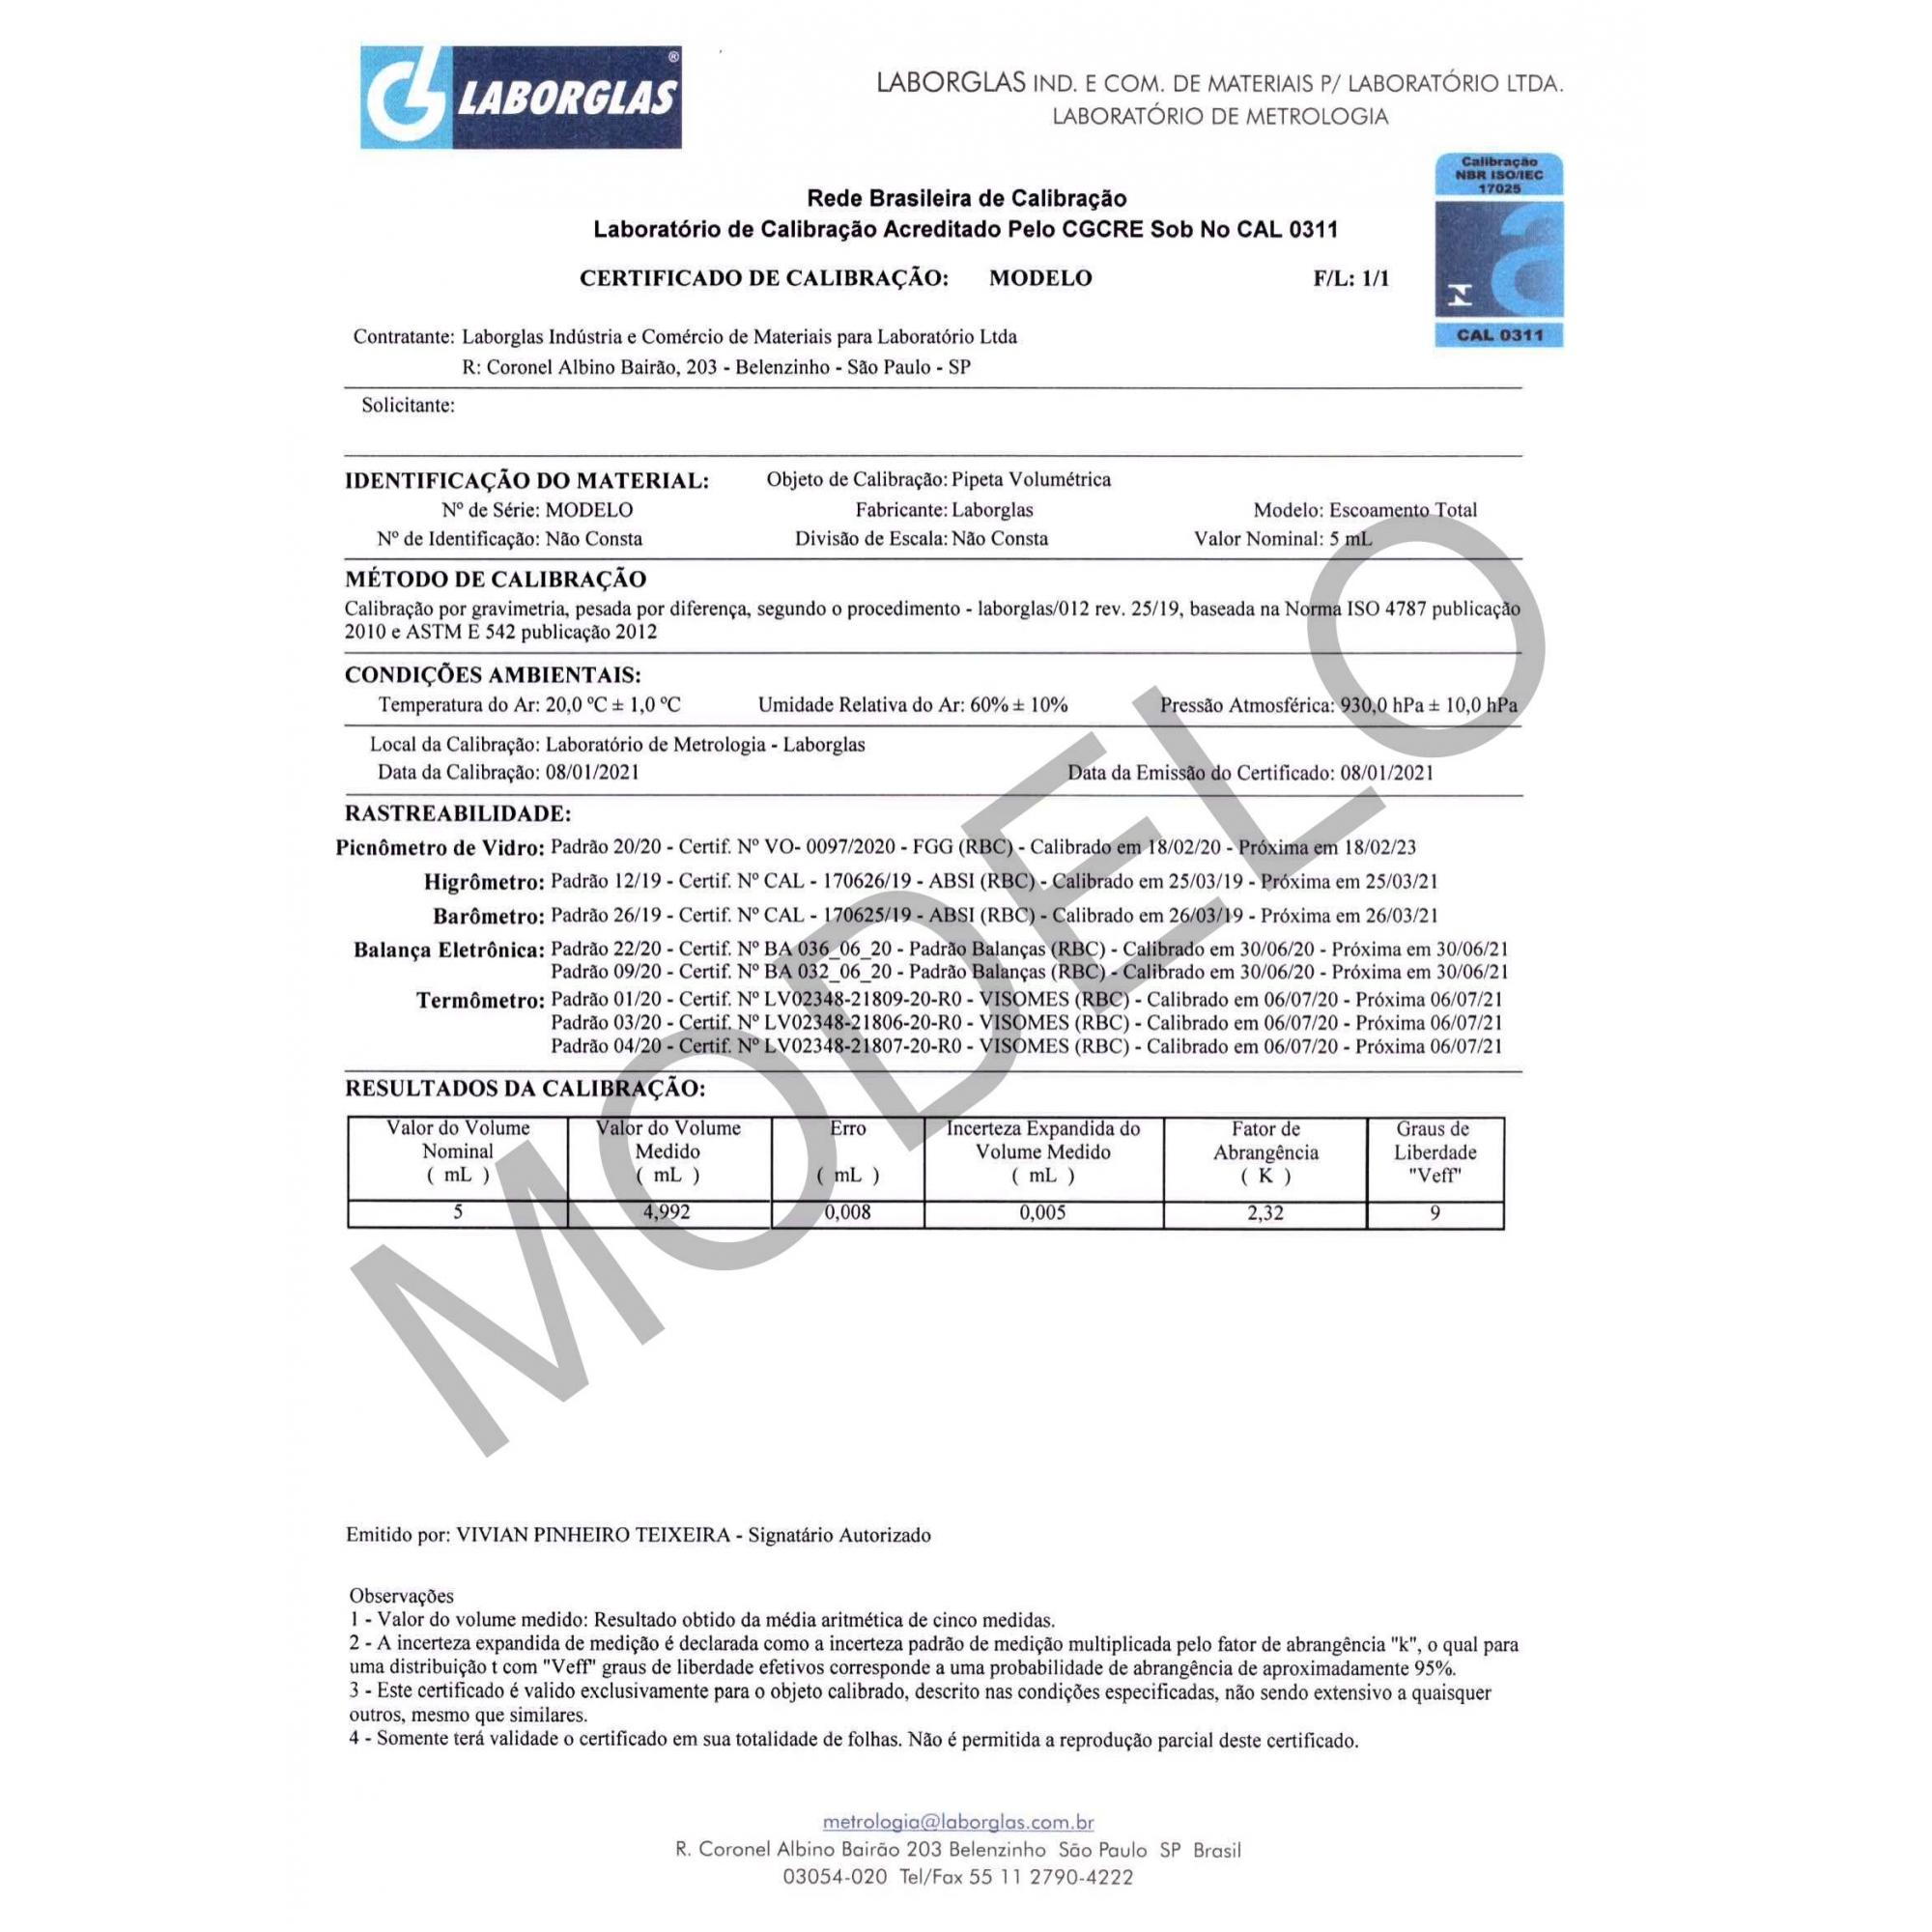 PIPETA VOLUMÉTRICA ESGOTAMENTO TOTAL 5,5 ML CERTIFICADO RBC - Laborglas - Cód. 9433723-R